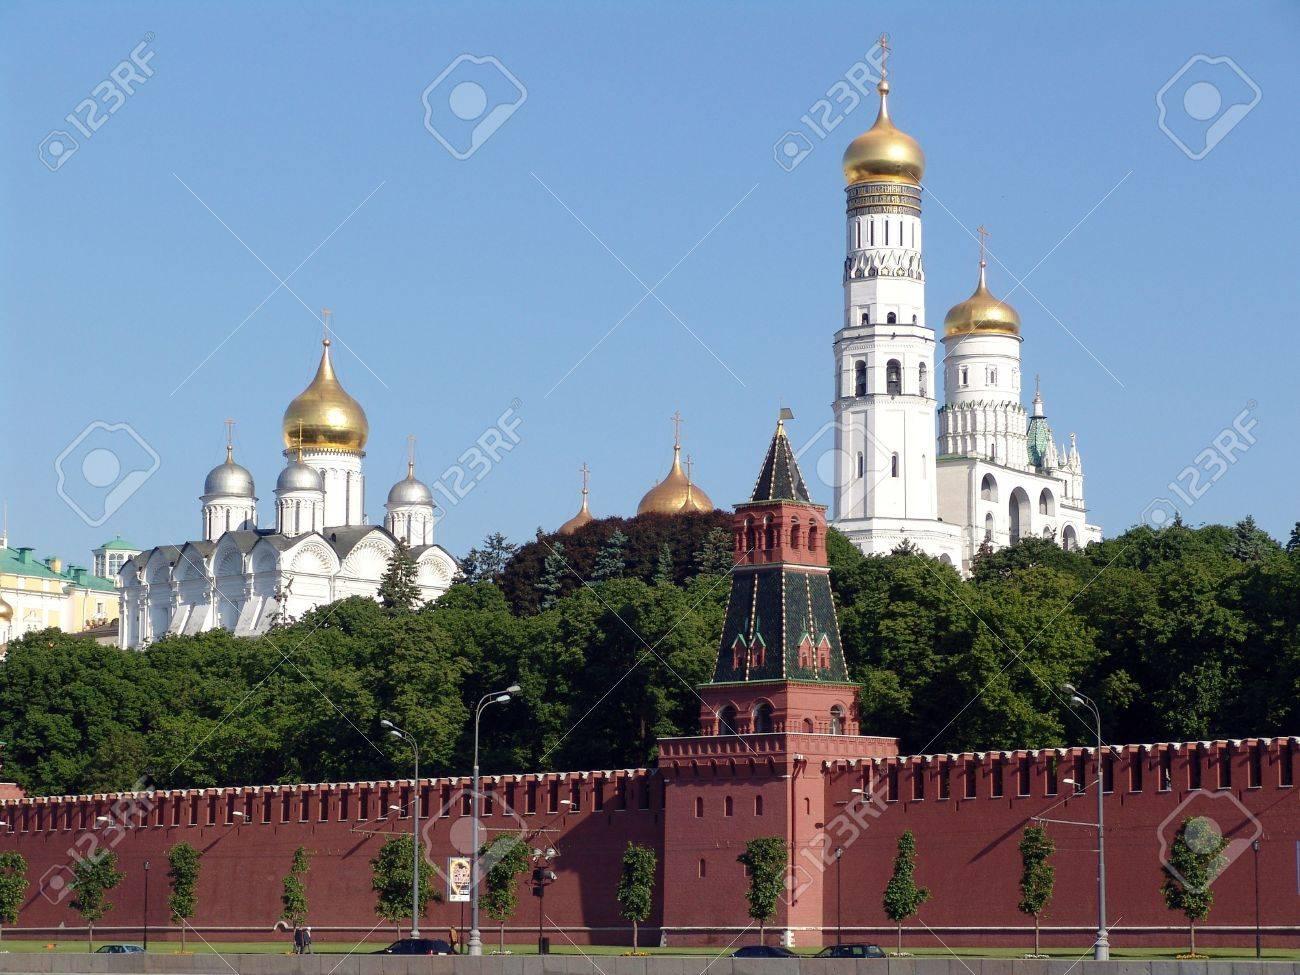 Kremlin quay, Moscow Kremlin, tower, Kremlin, Moscow, Russia - 2081247